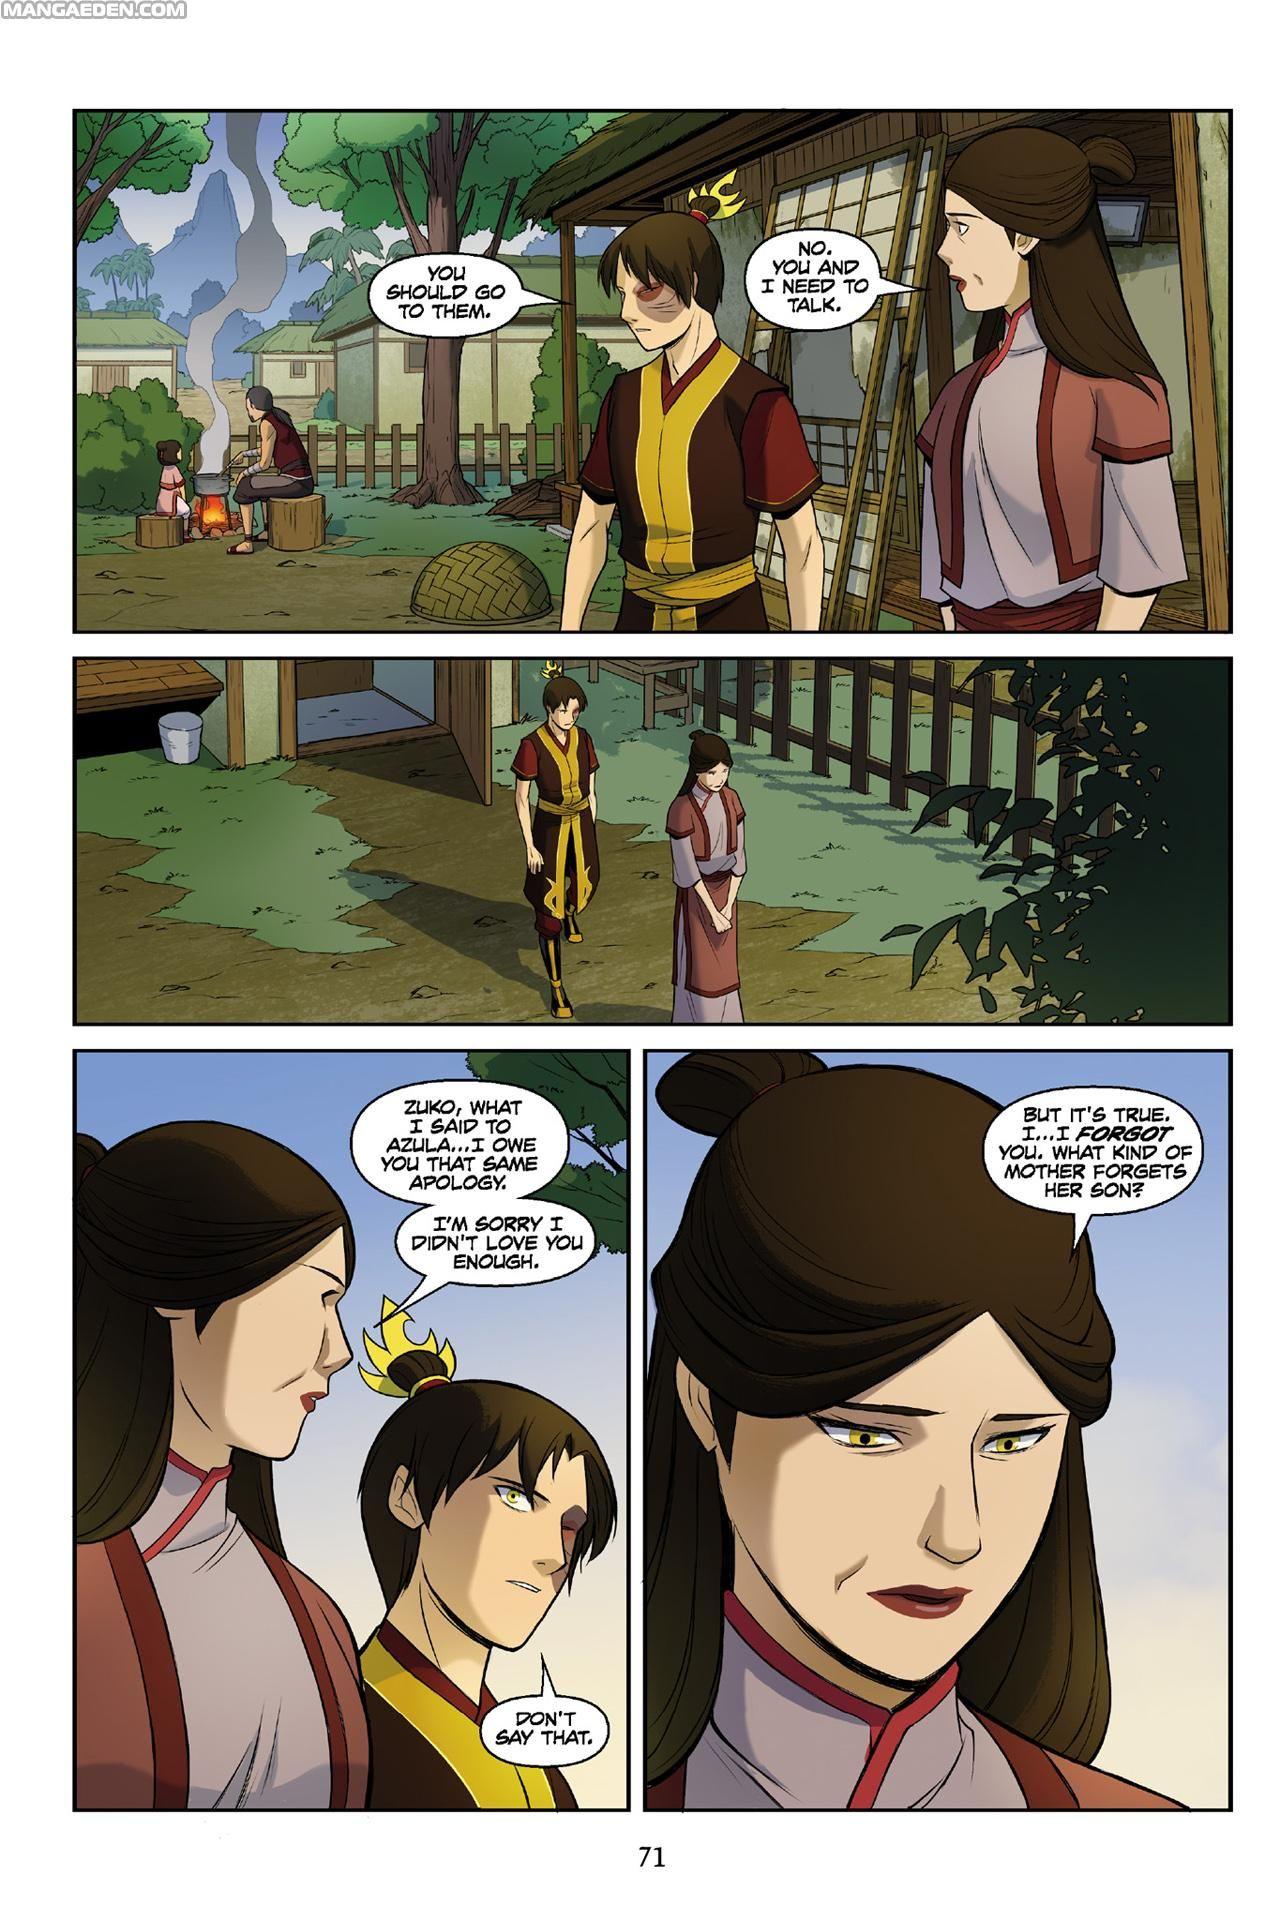 Park Art|My WordPress Blog_Read Avatar The Last Airbender Comics Online Free The Search